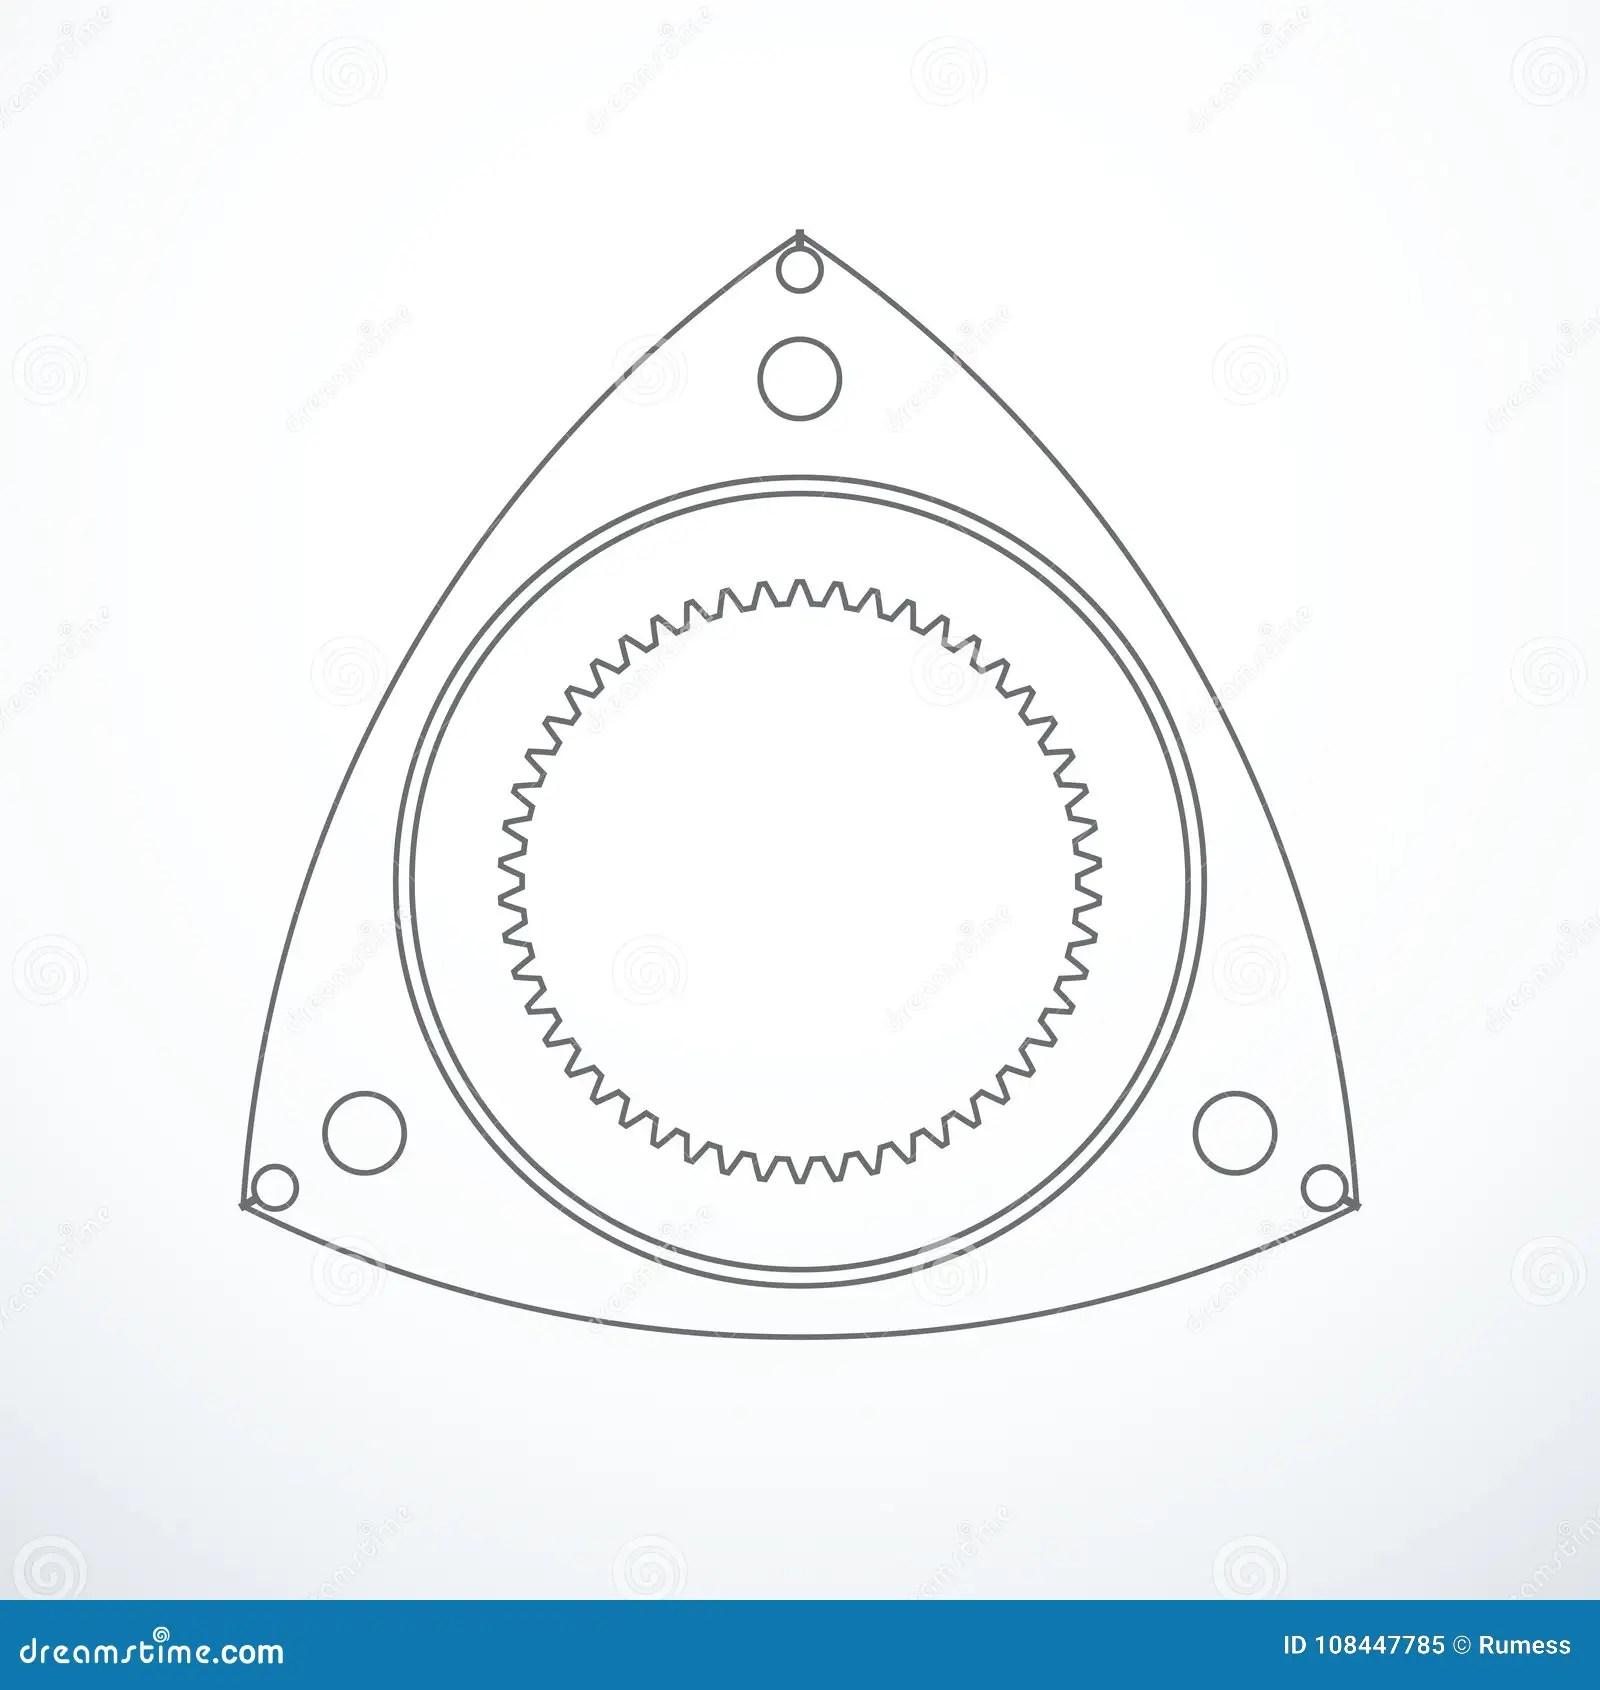 Rotor Of Rotary Wankel Engine Vector Illustration Stock Vector